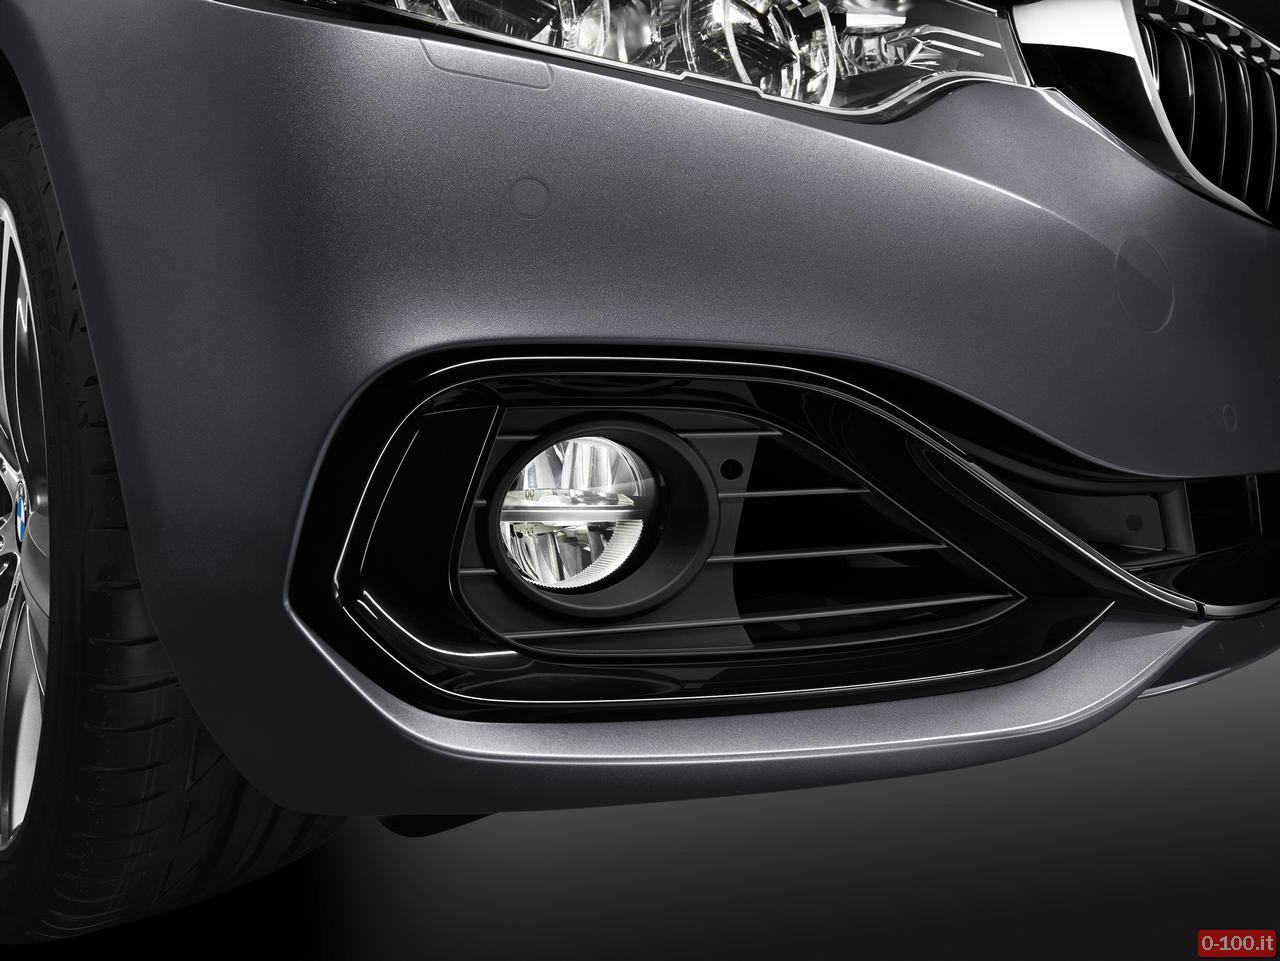 bmw_serie-4-coupé_0-100_81